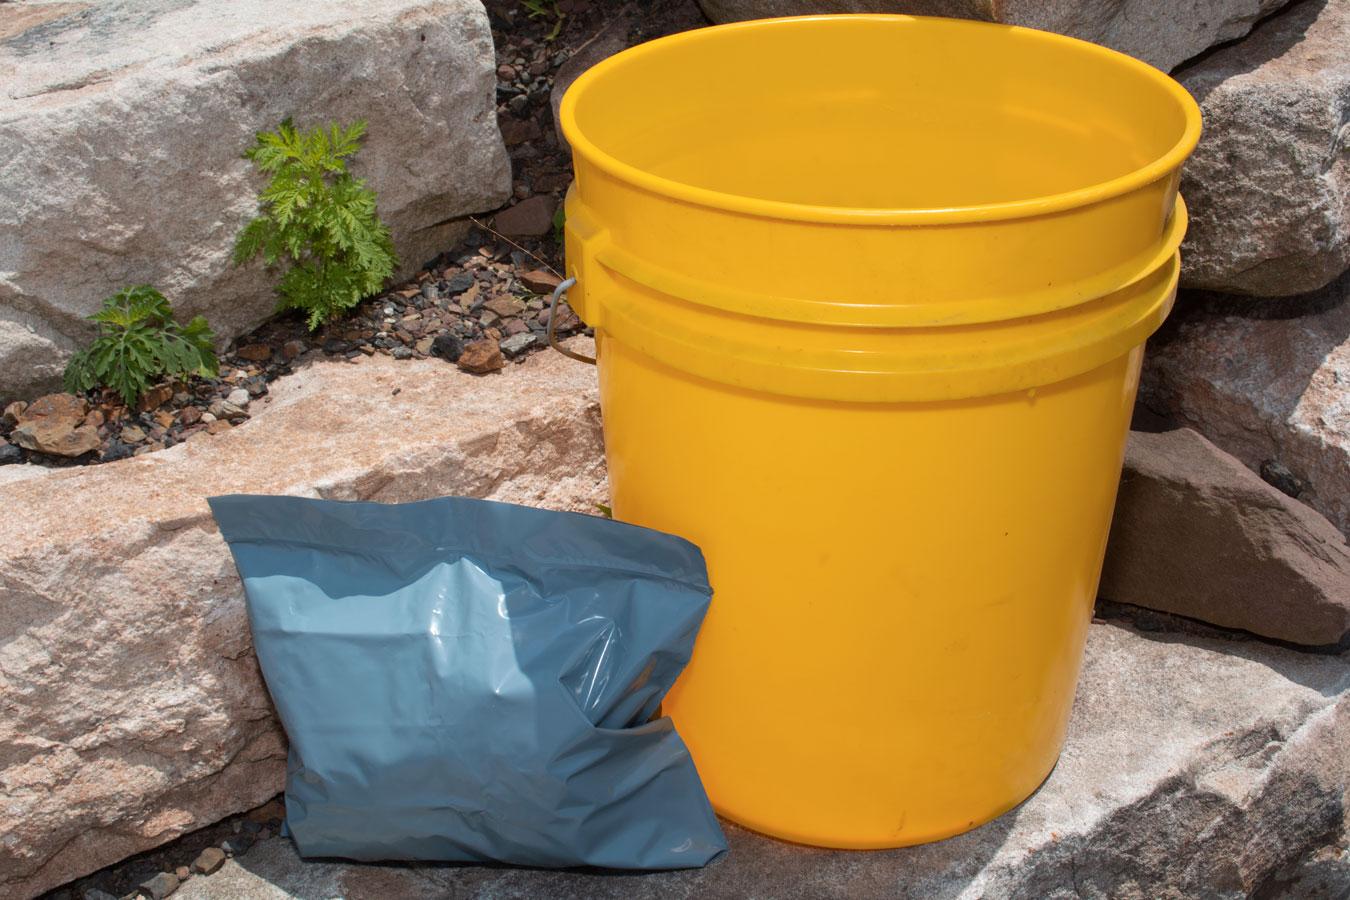 U.S. G.I. Go Anywhere Toilet Kit Bags